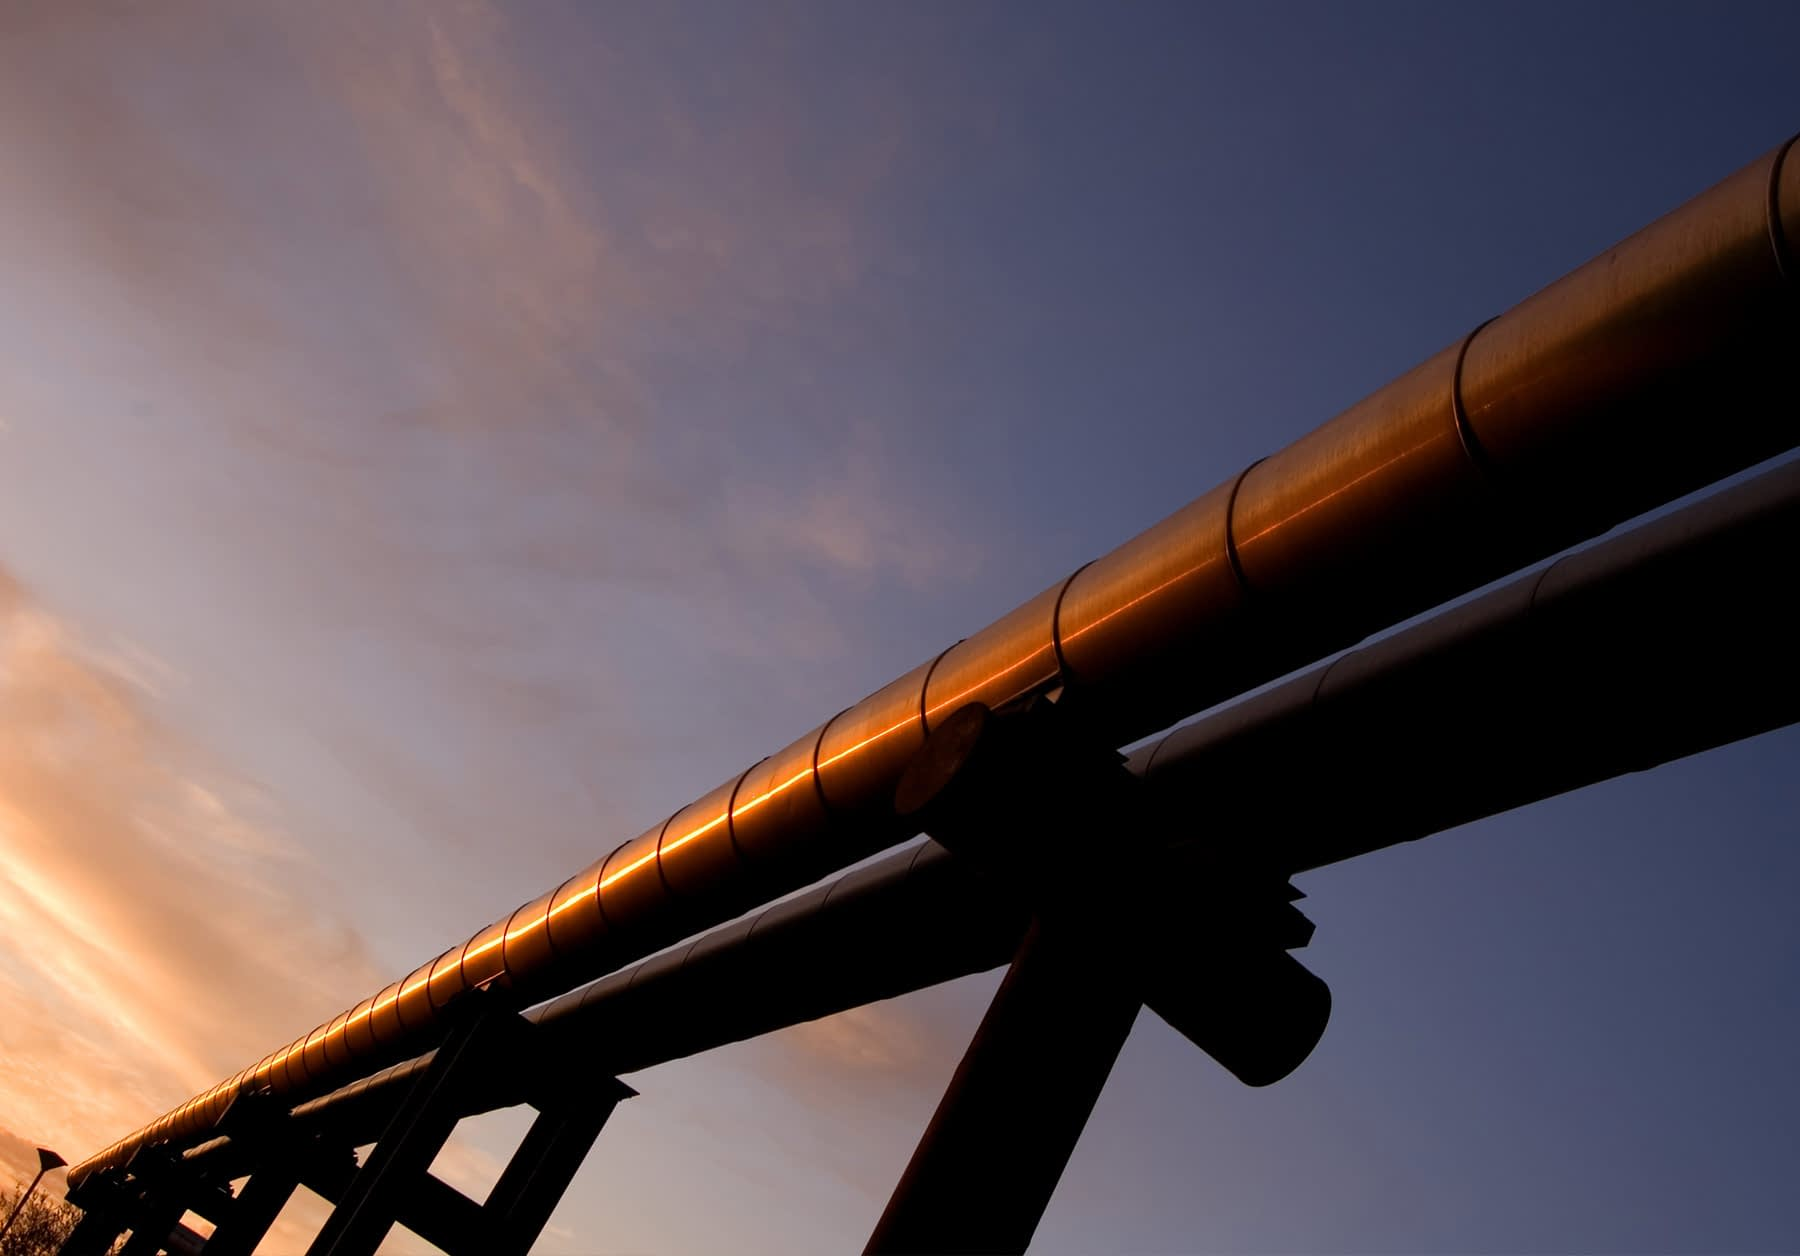 Oil & Gas Pipeline in Colombia